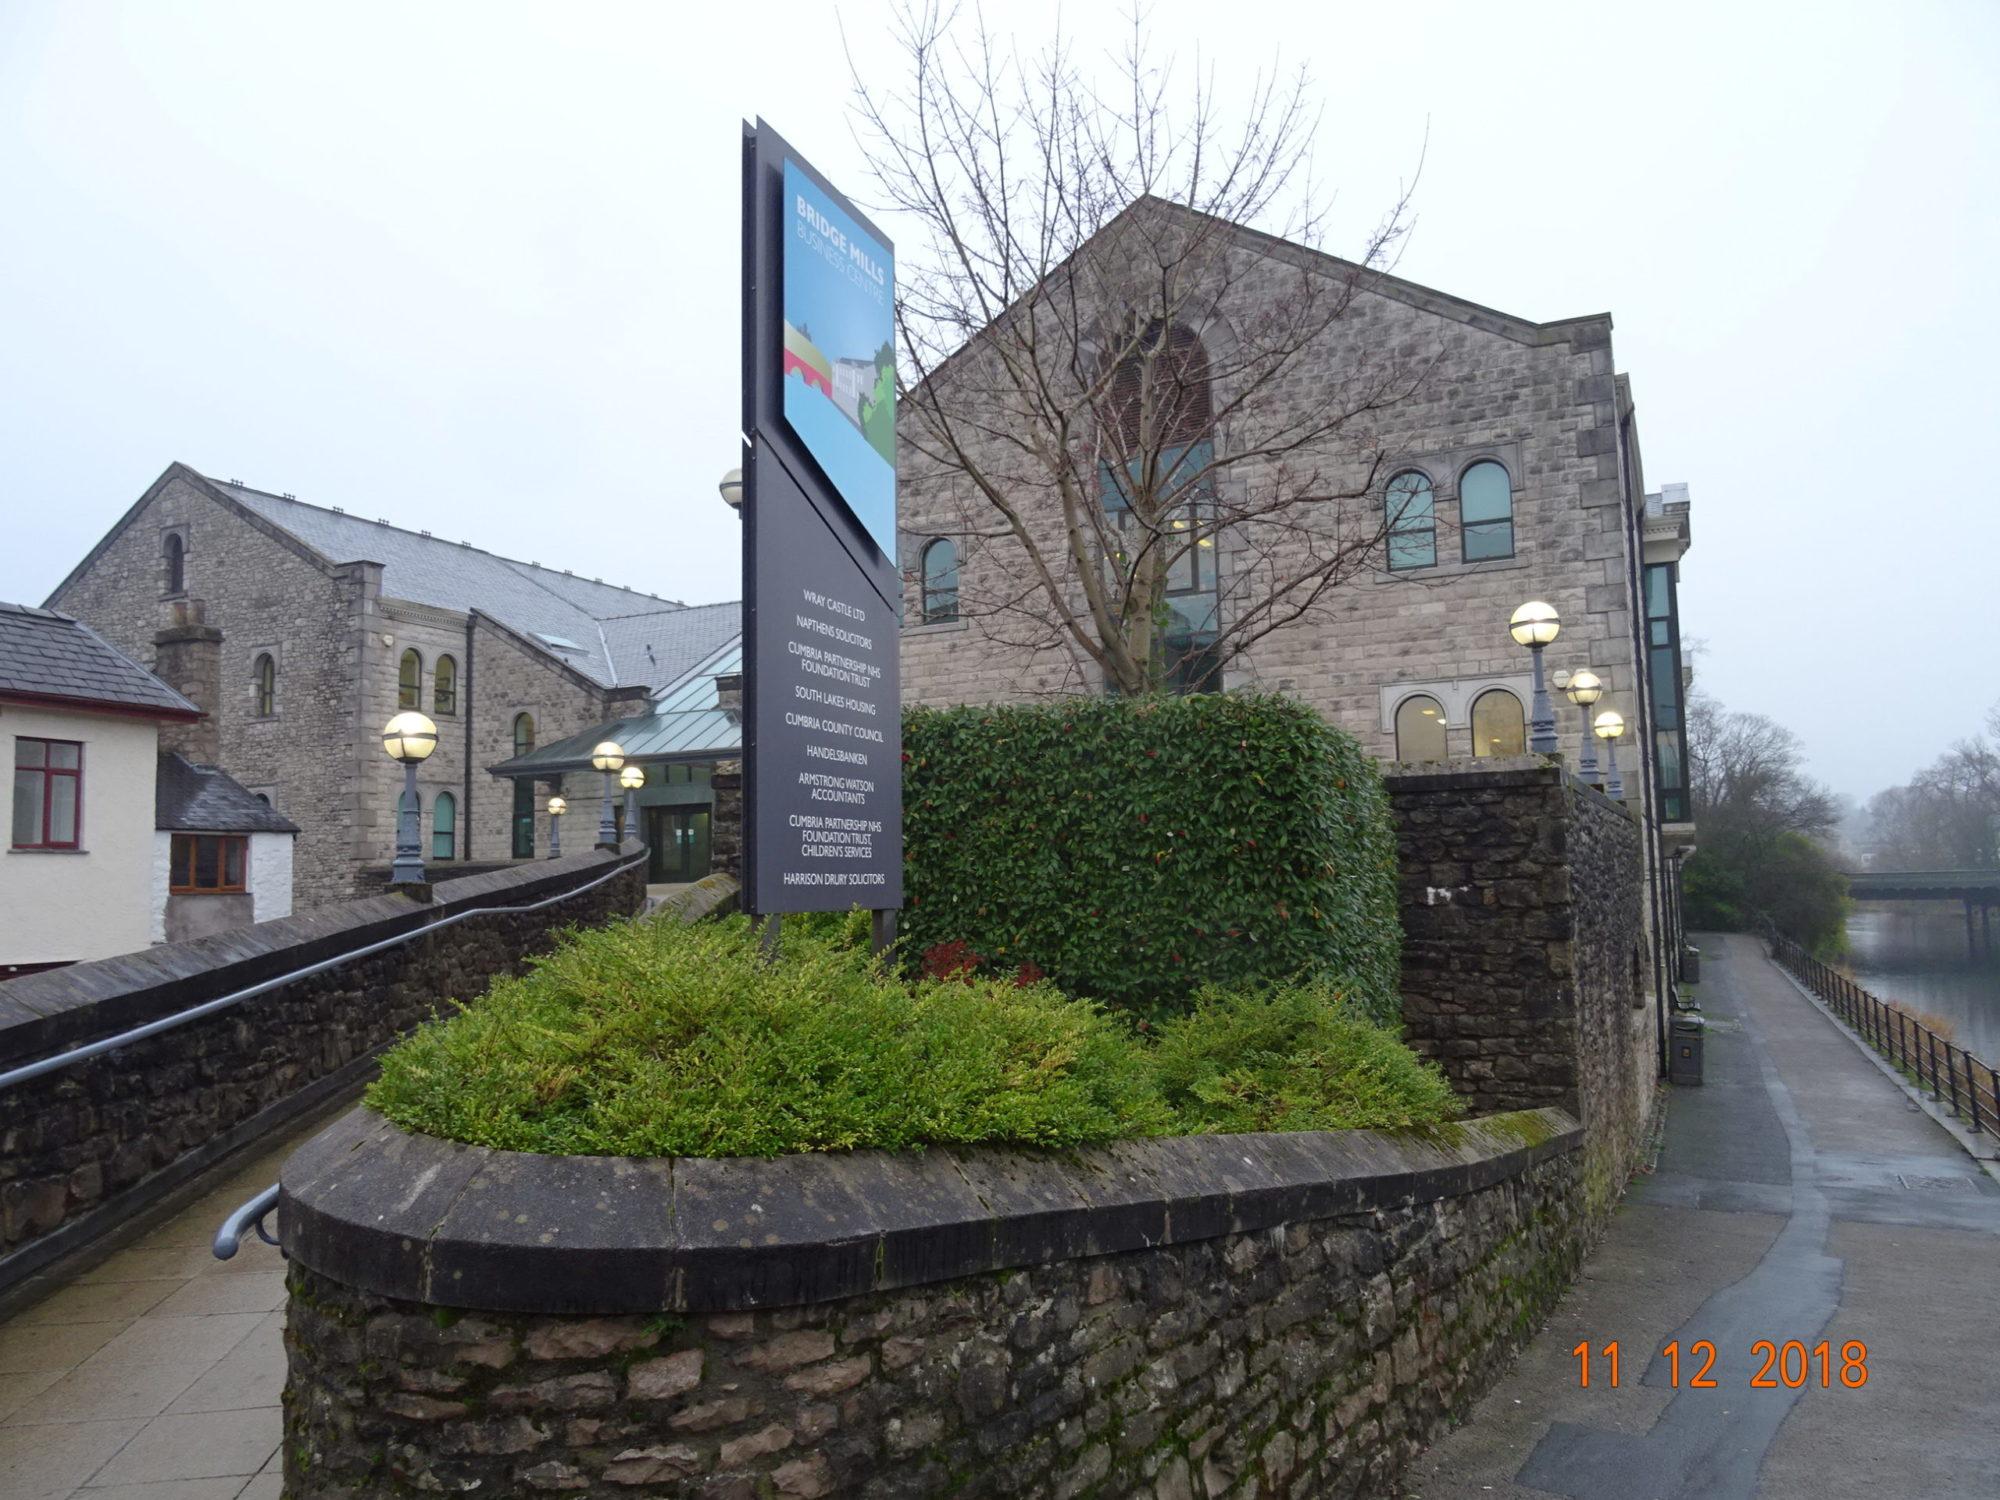 Bridge Mills, Kendal – TM44 level 4 assessment